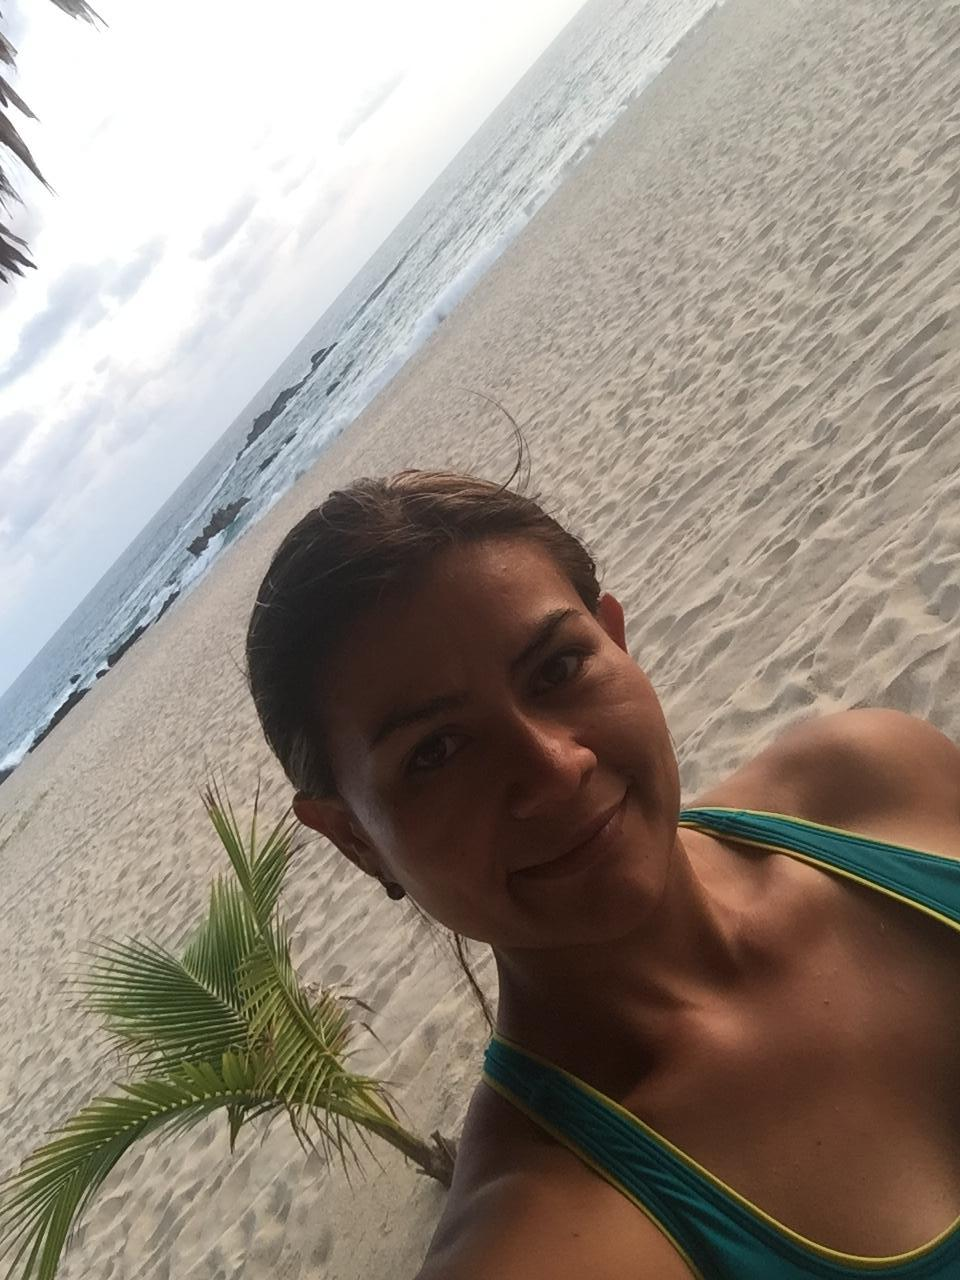 Enjoying the Beach!